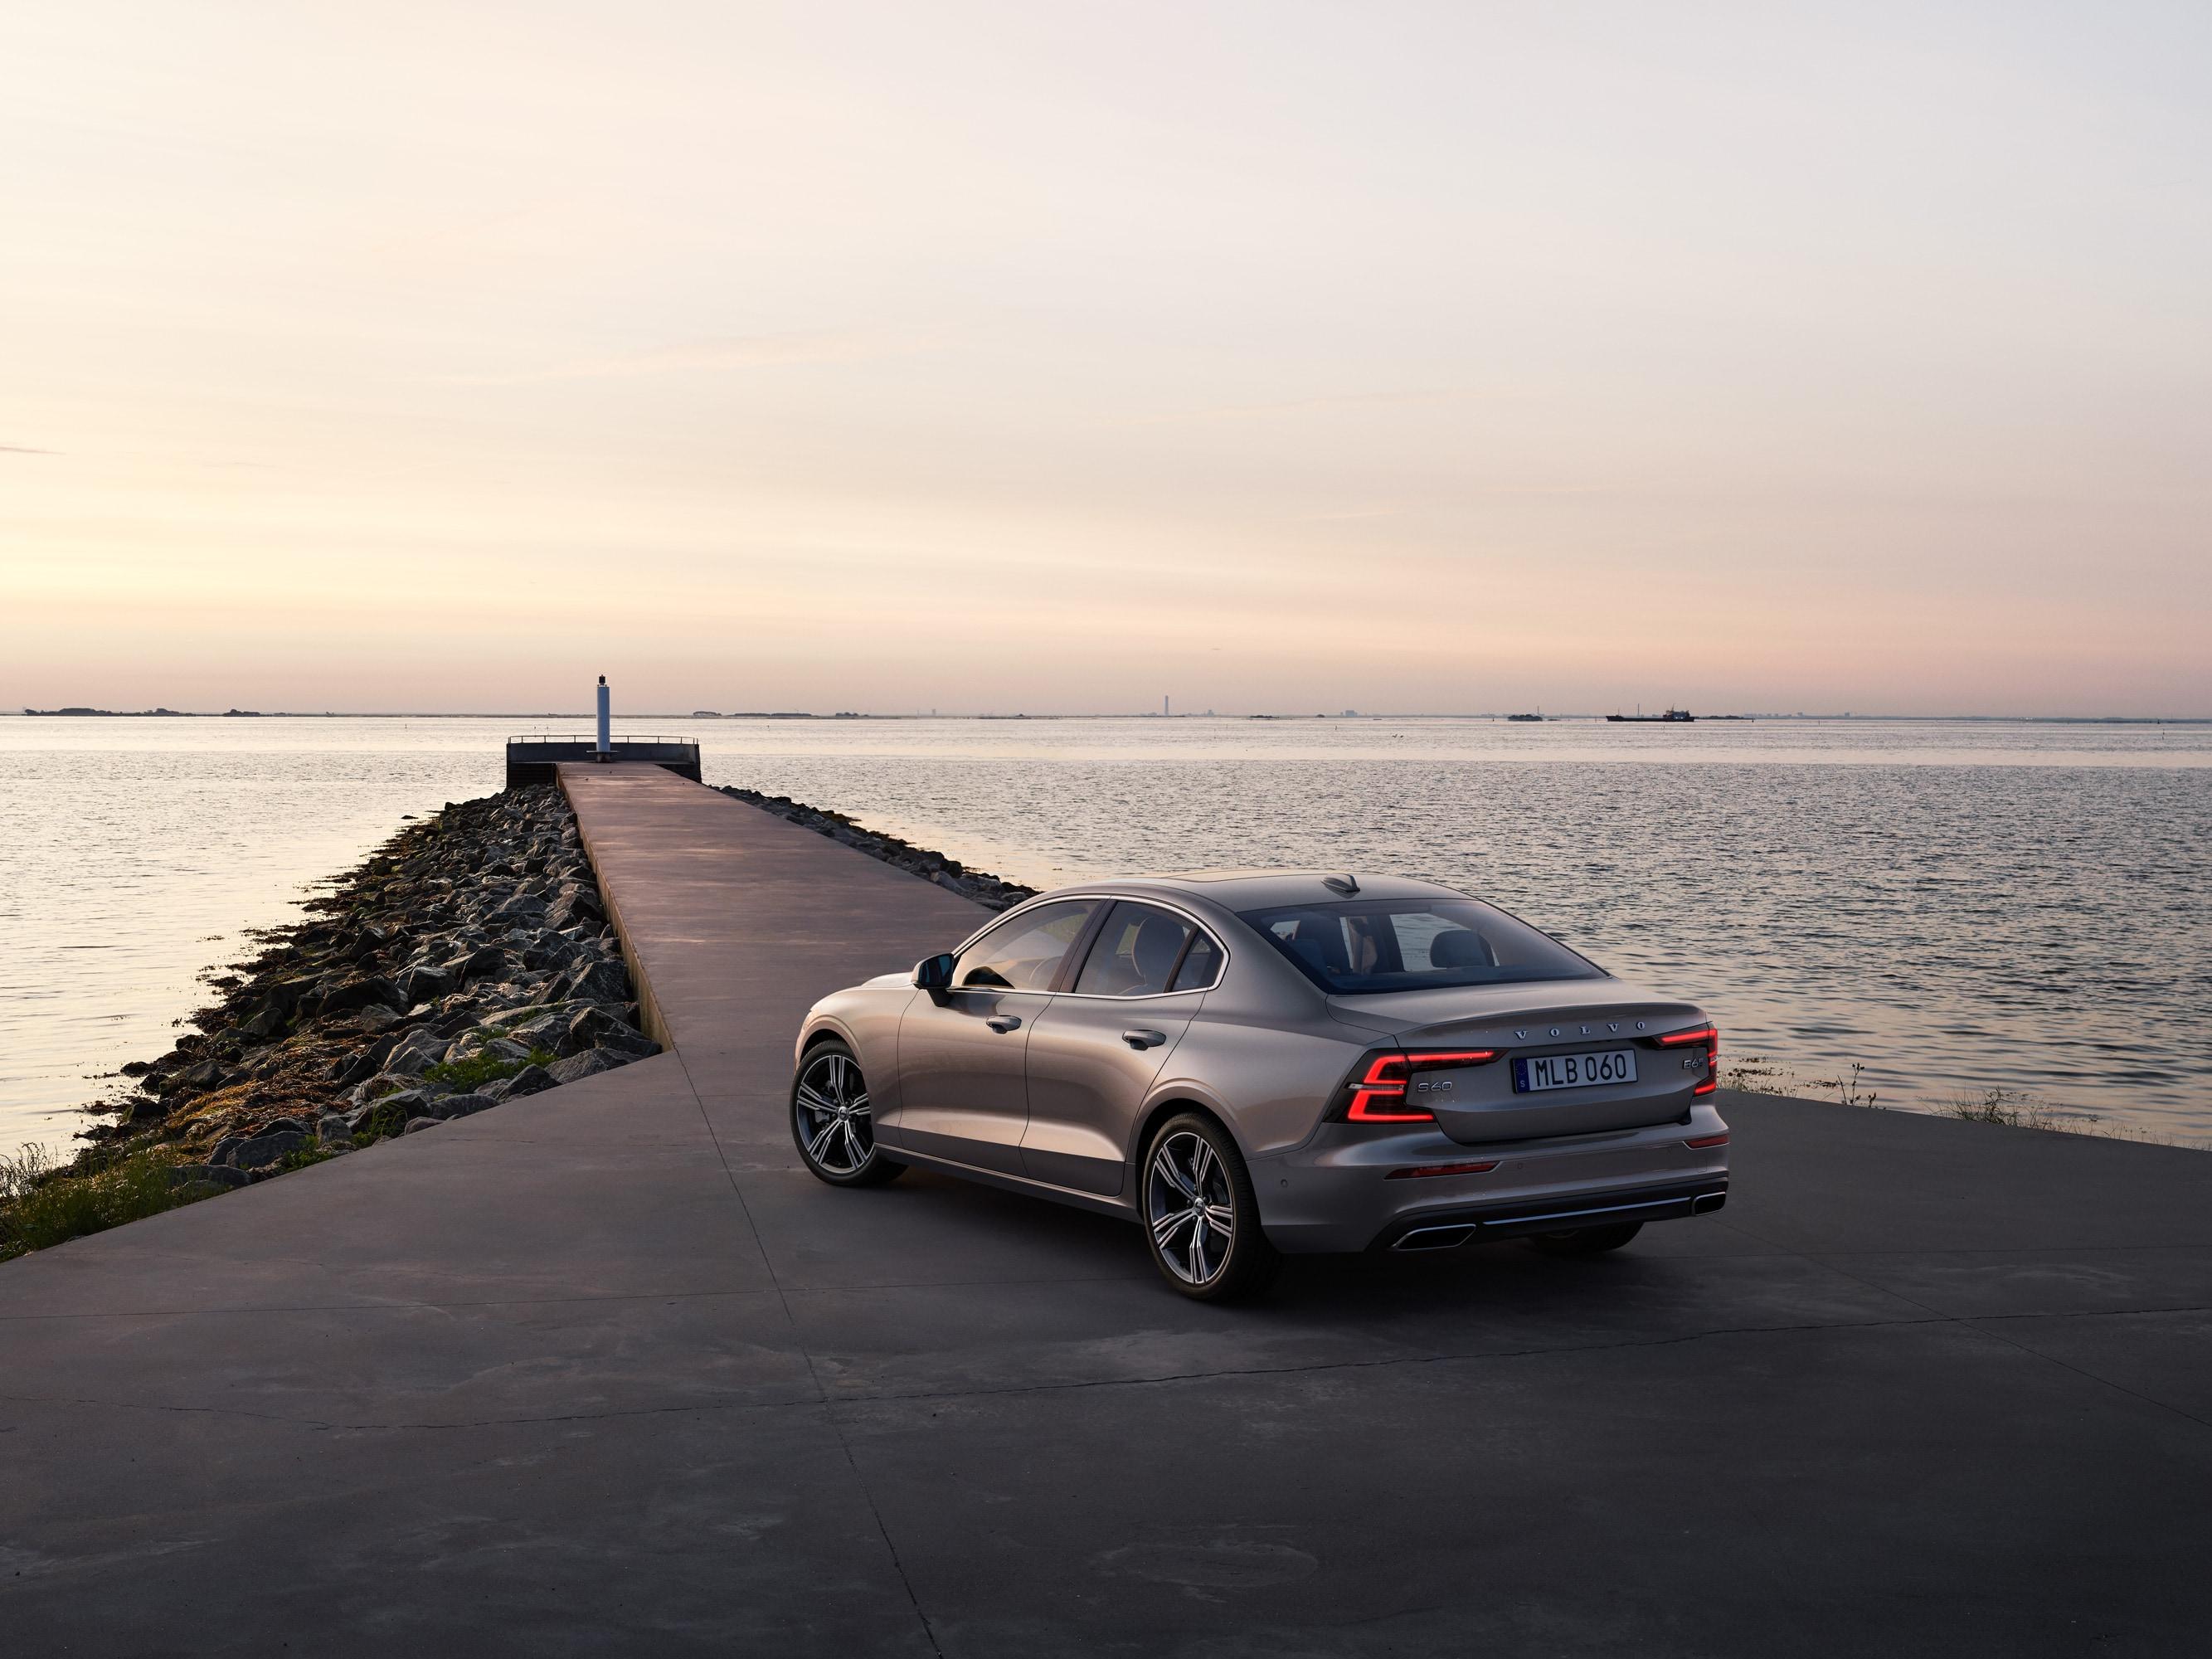 Volvo S60 zaparkované u moře